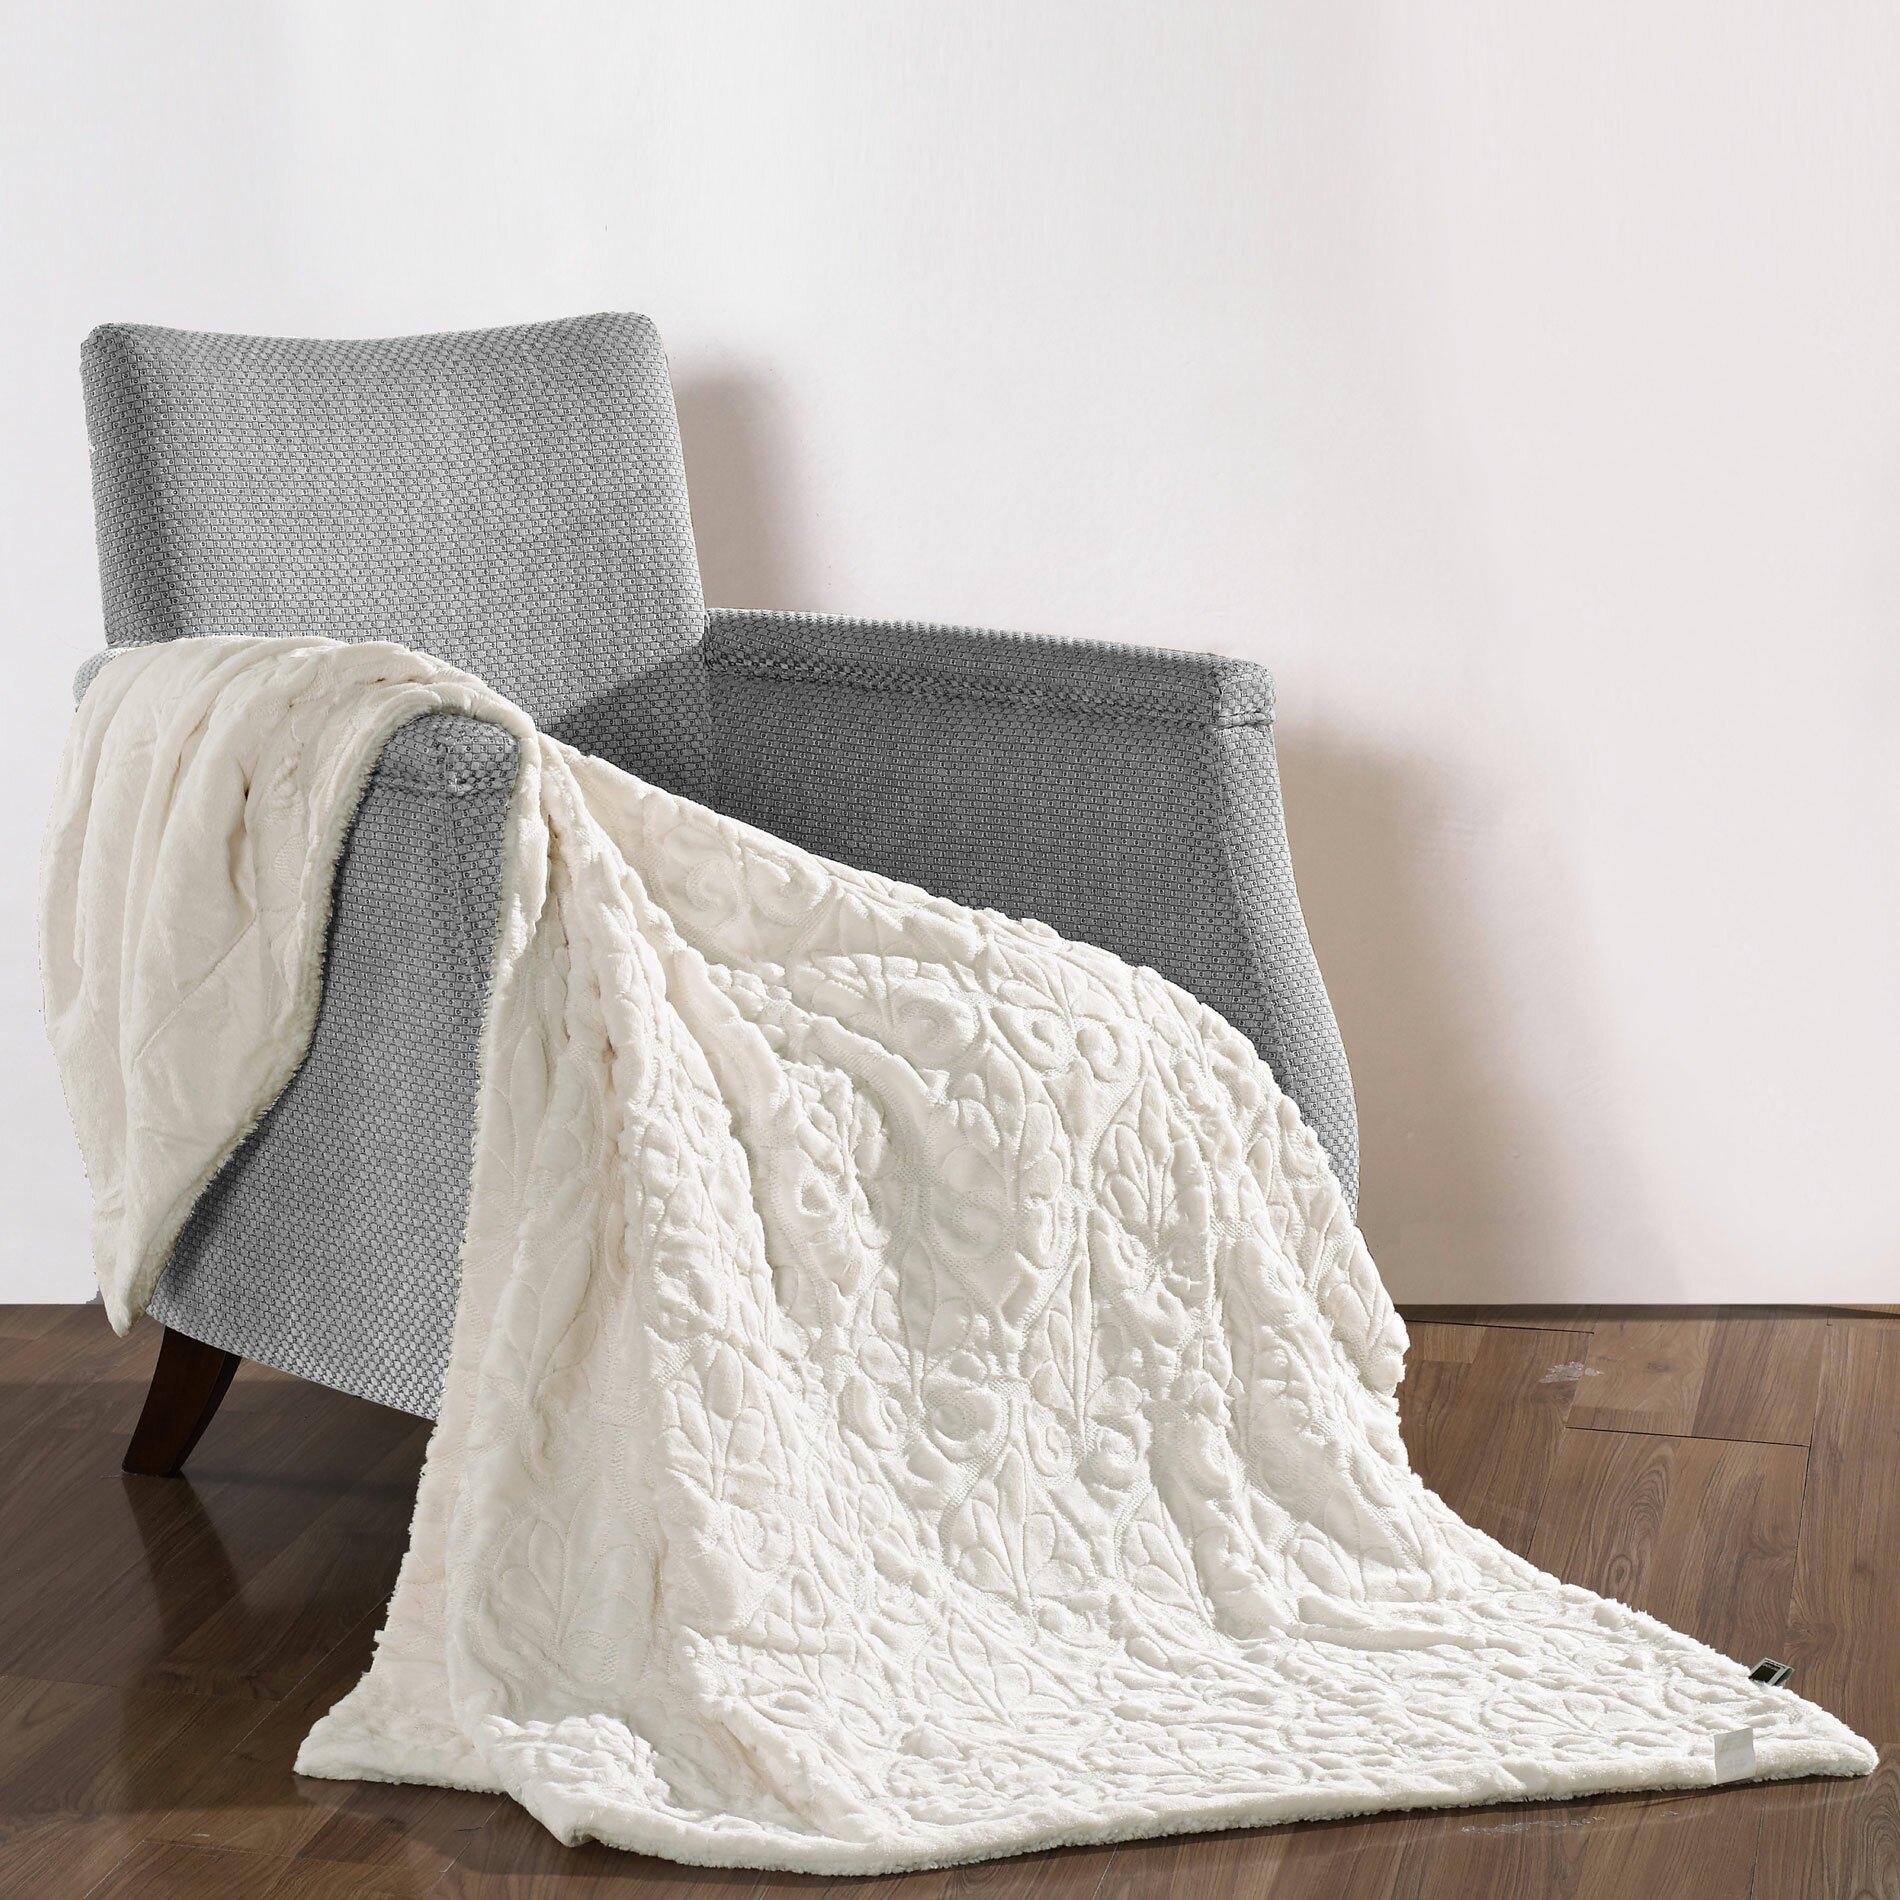 boon throw blanket pamila faux fur sherpa throw reviews wayfair. Black Bedroom Furniture Sets. Home Design Ideas